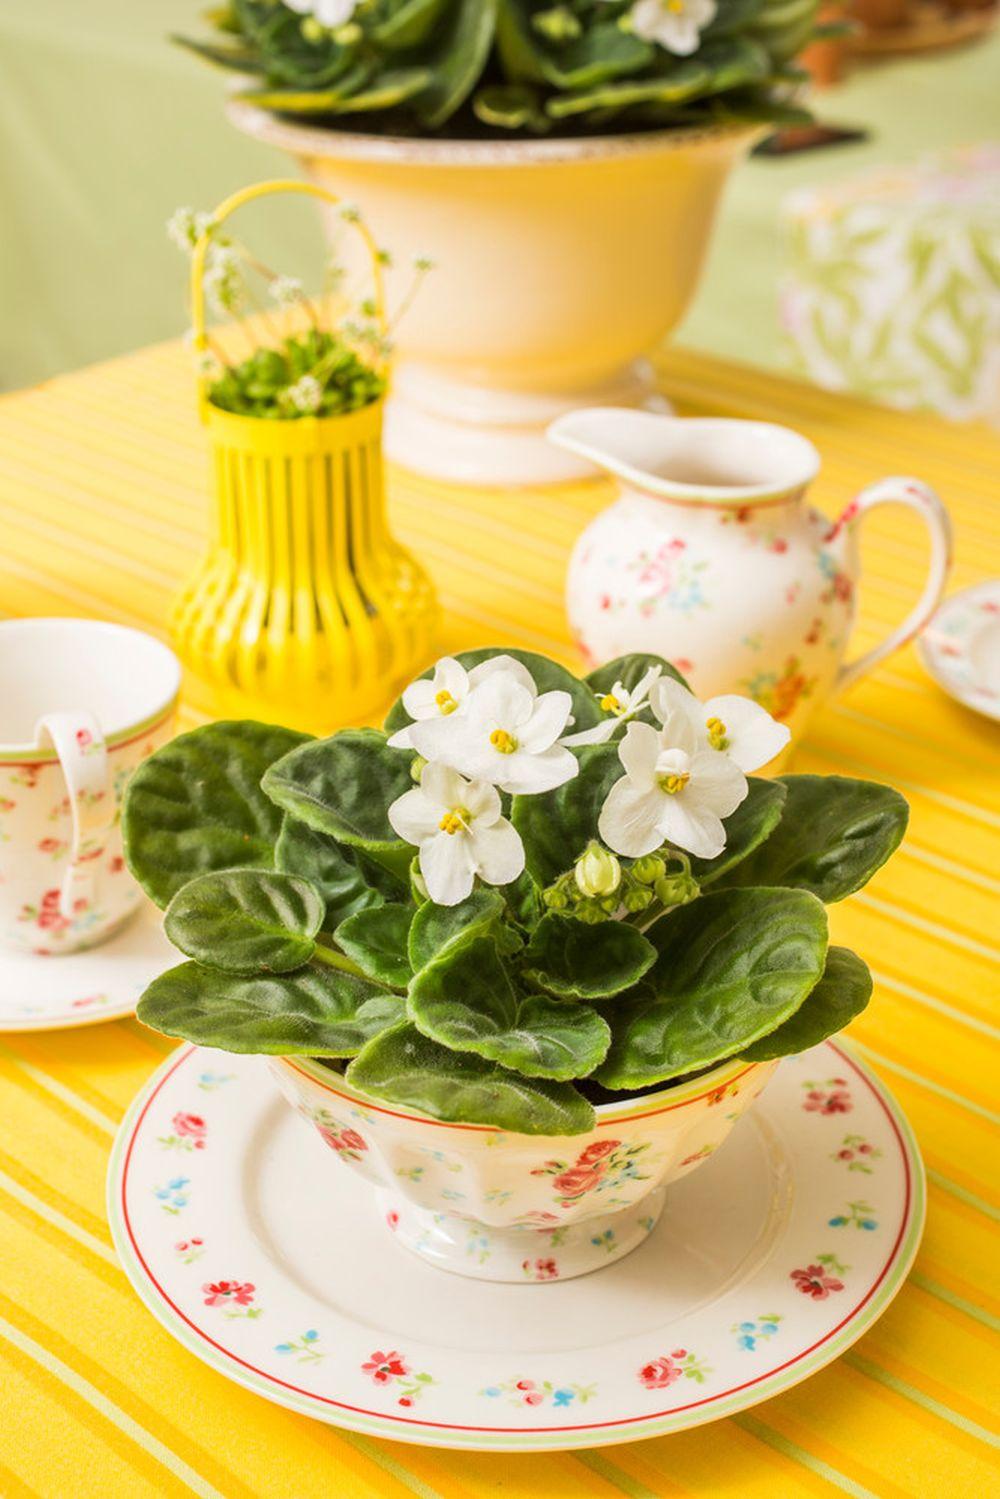 adelaparvu.com despre violetele de Parma, Saintpaulia, Text Carli Marian, Foto Floradania (9)